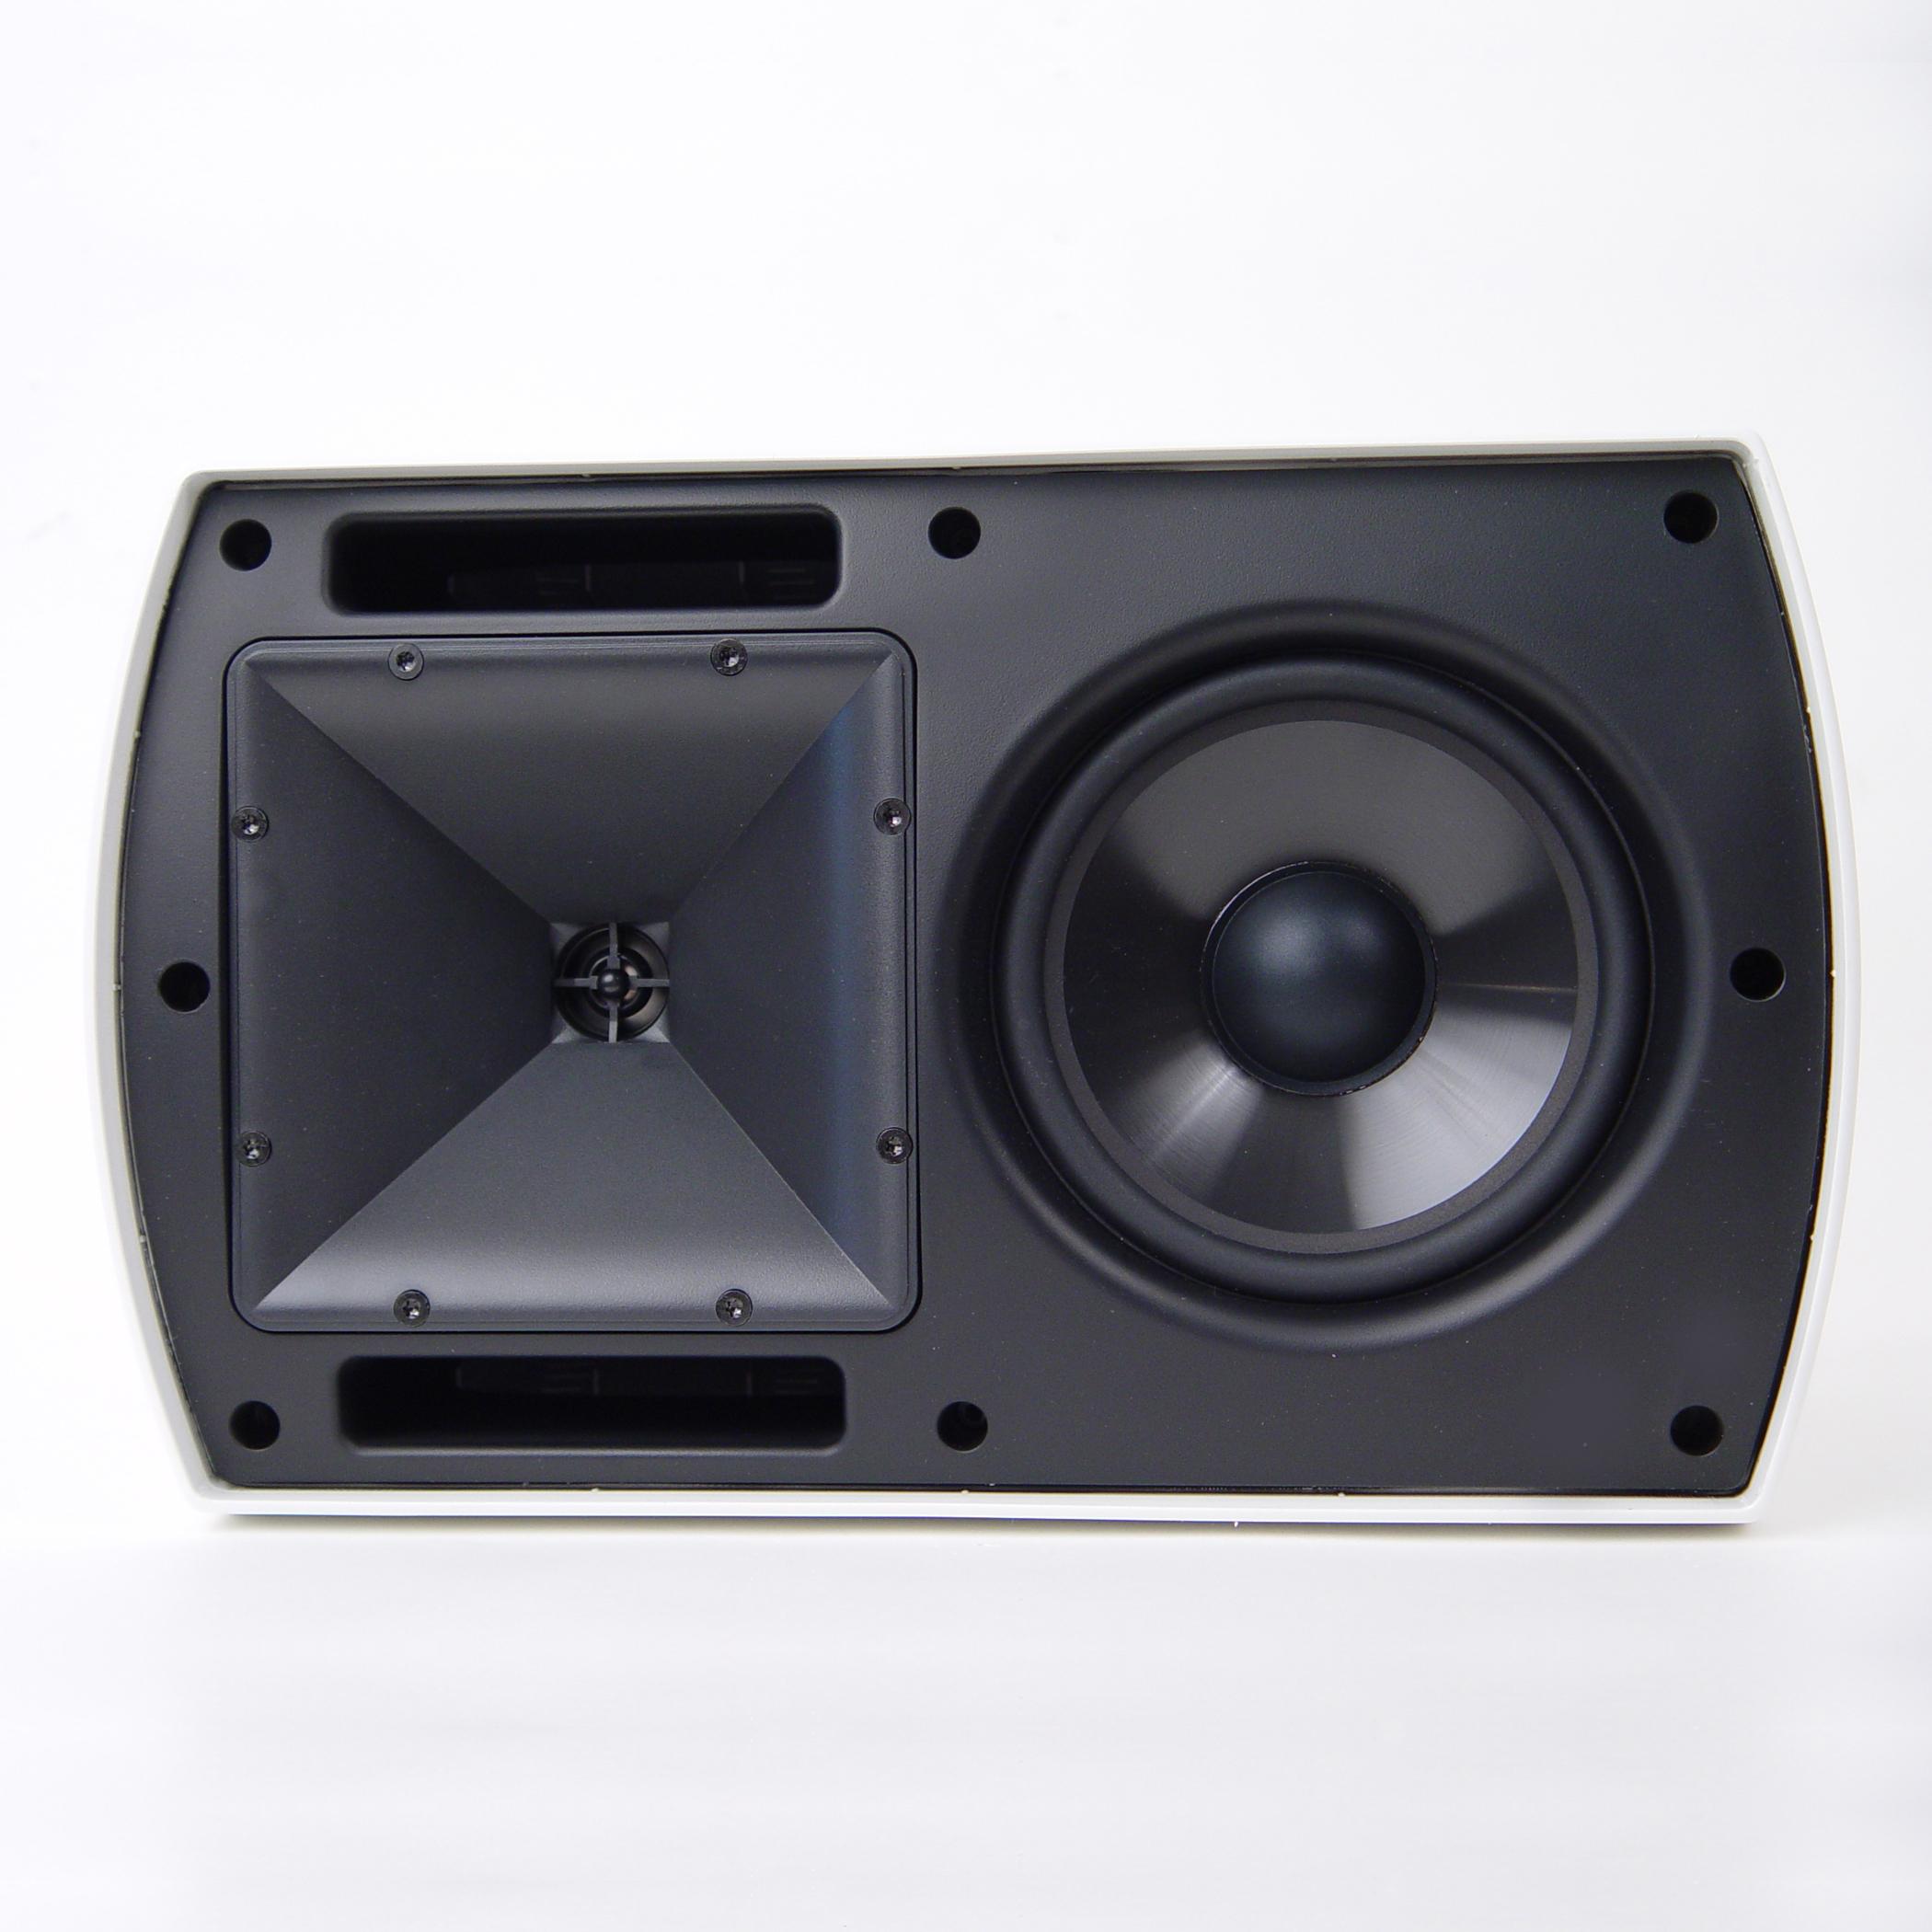 klipsch car speakers. aw 650 4 klipsch car speakers